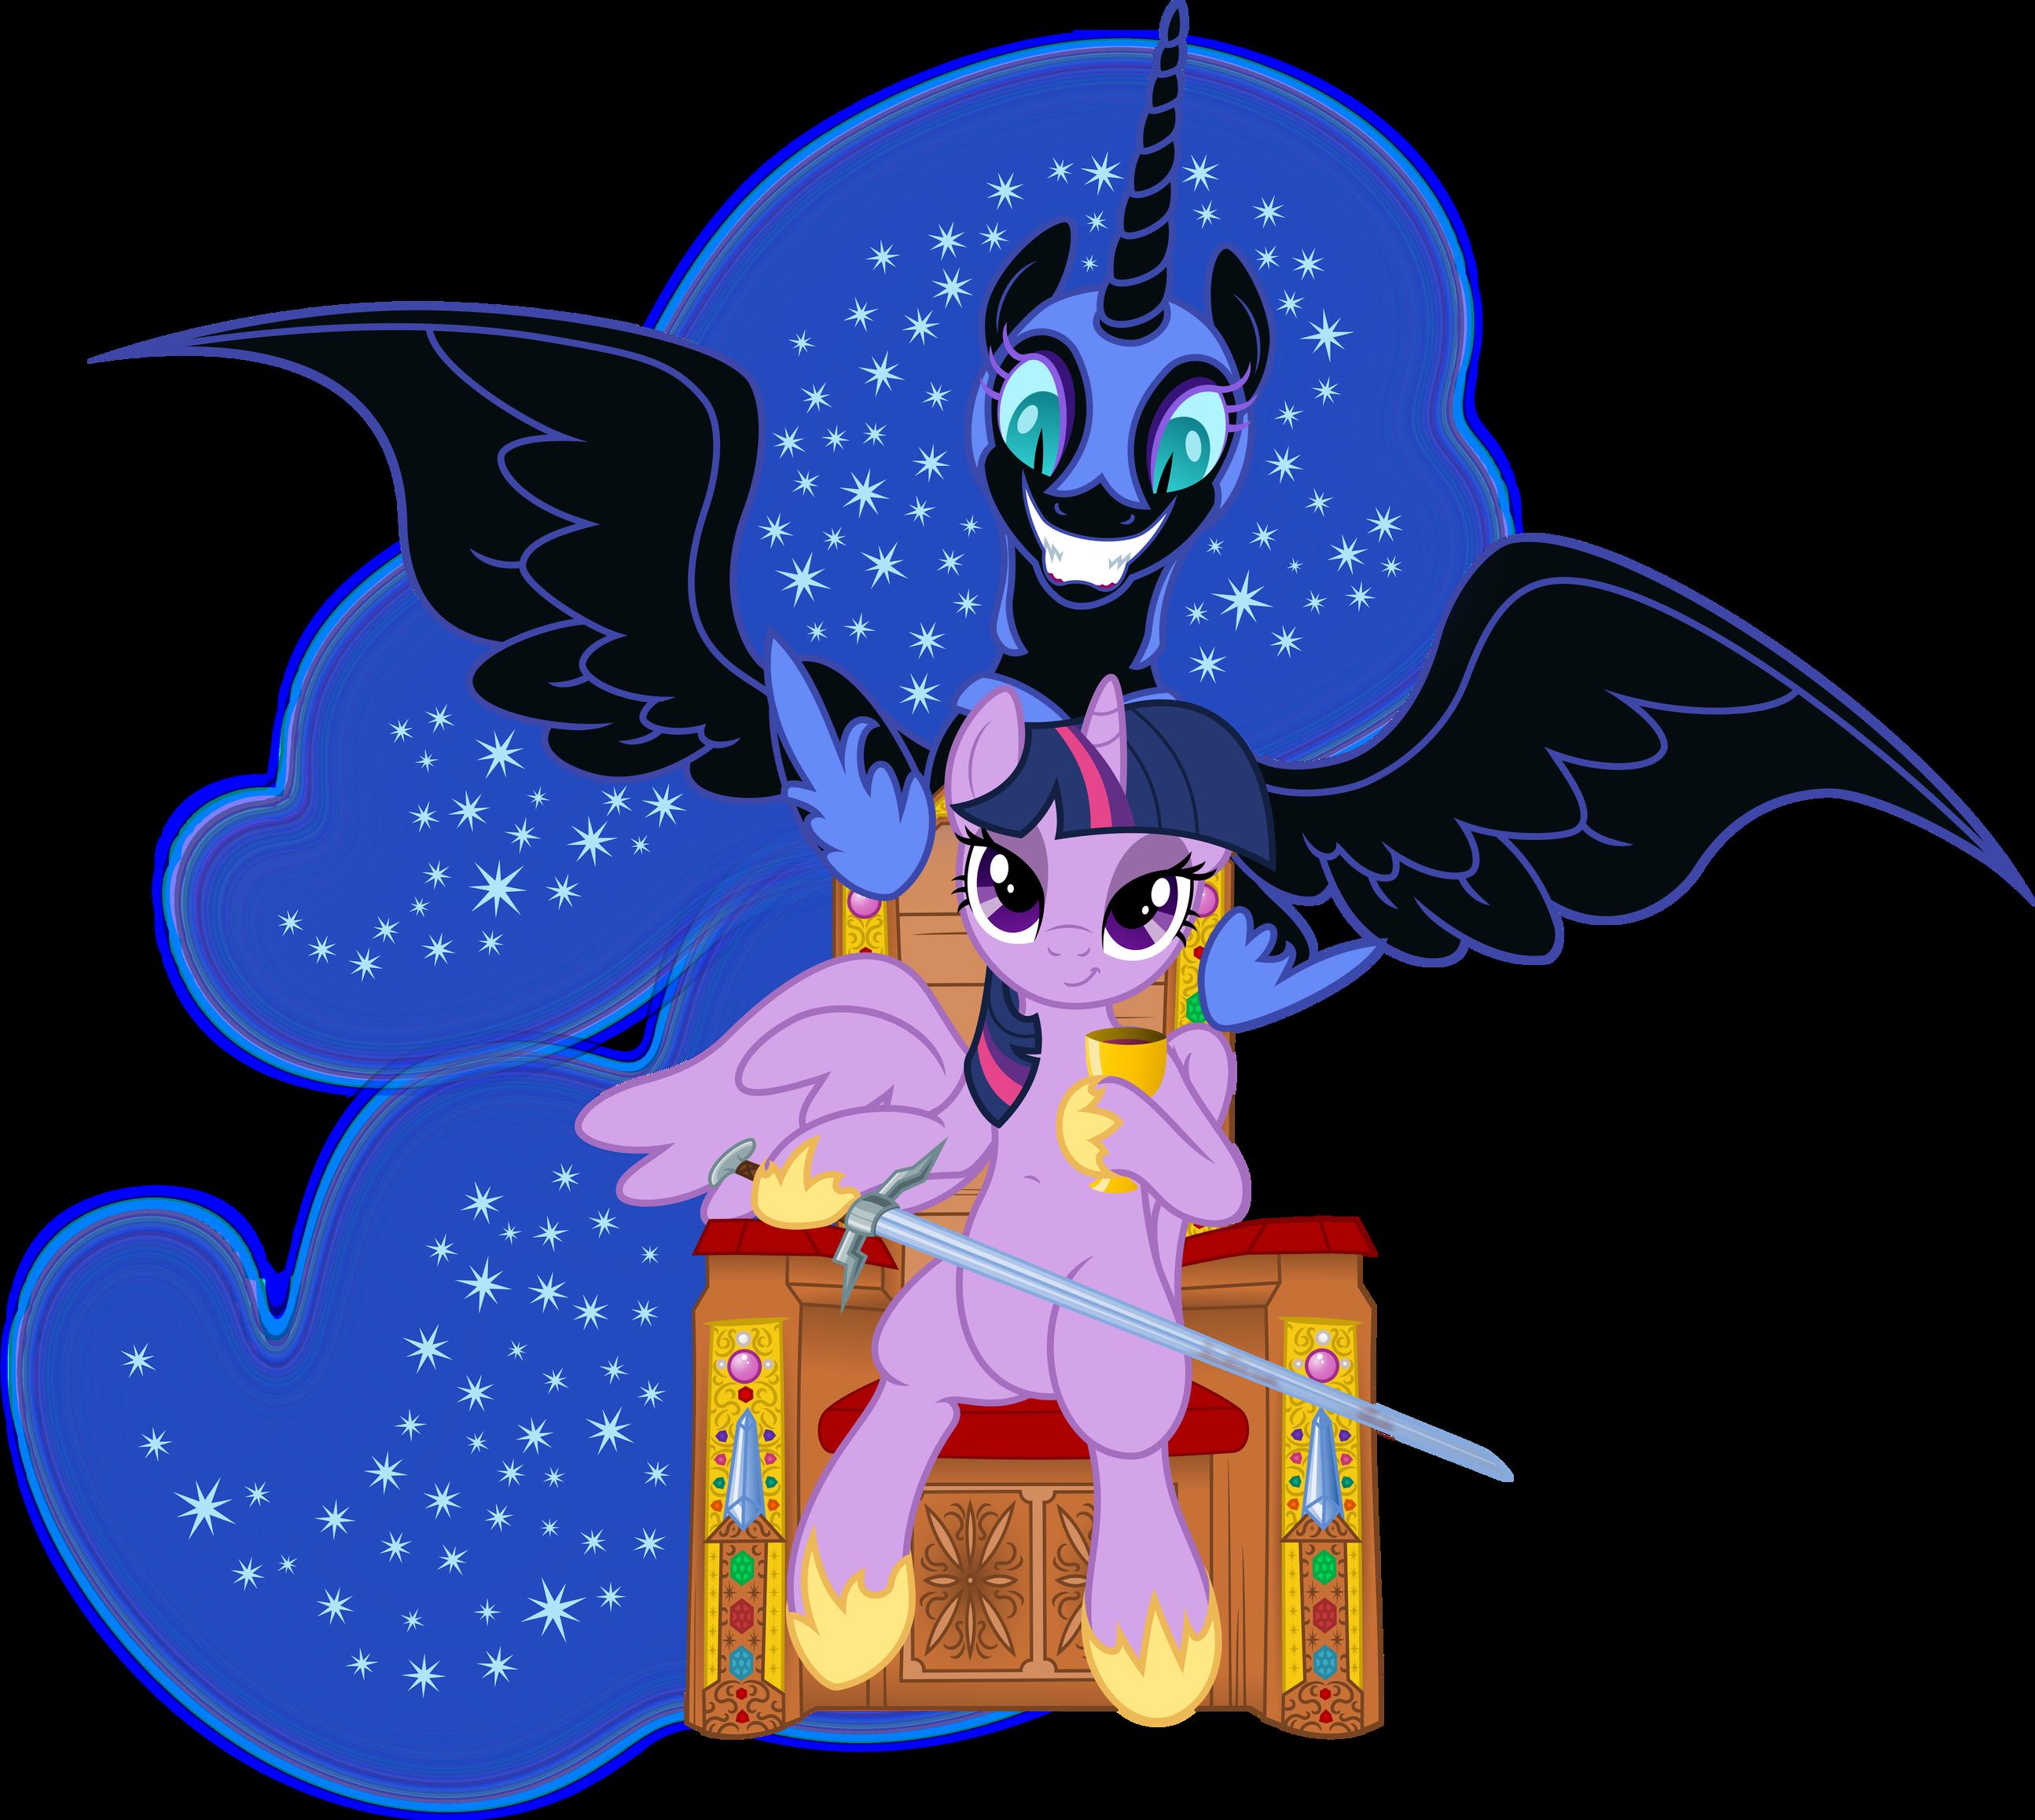 Vector Twilight Sparkle and Nightmare Moon by DeyrasD